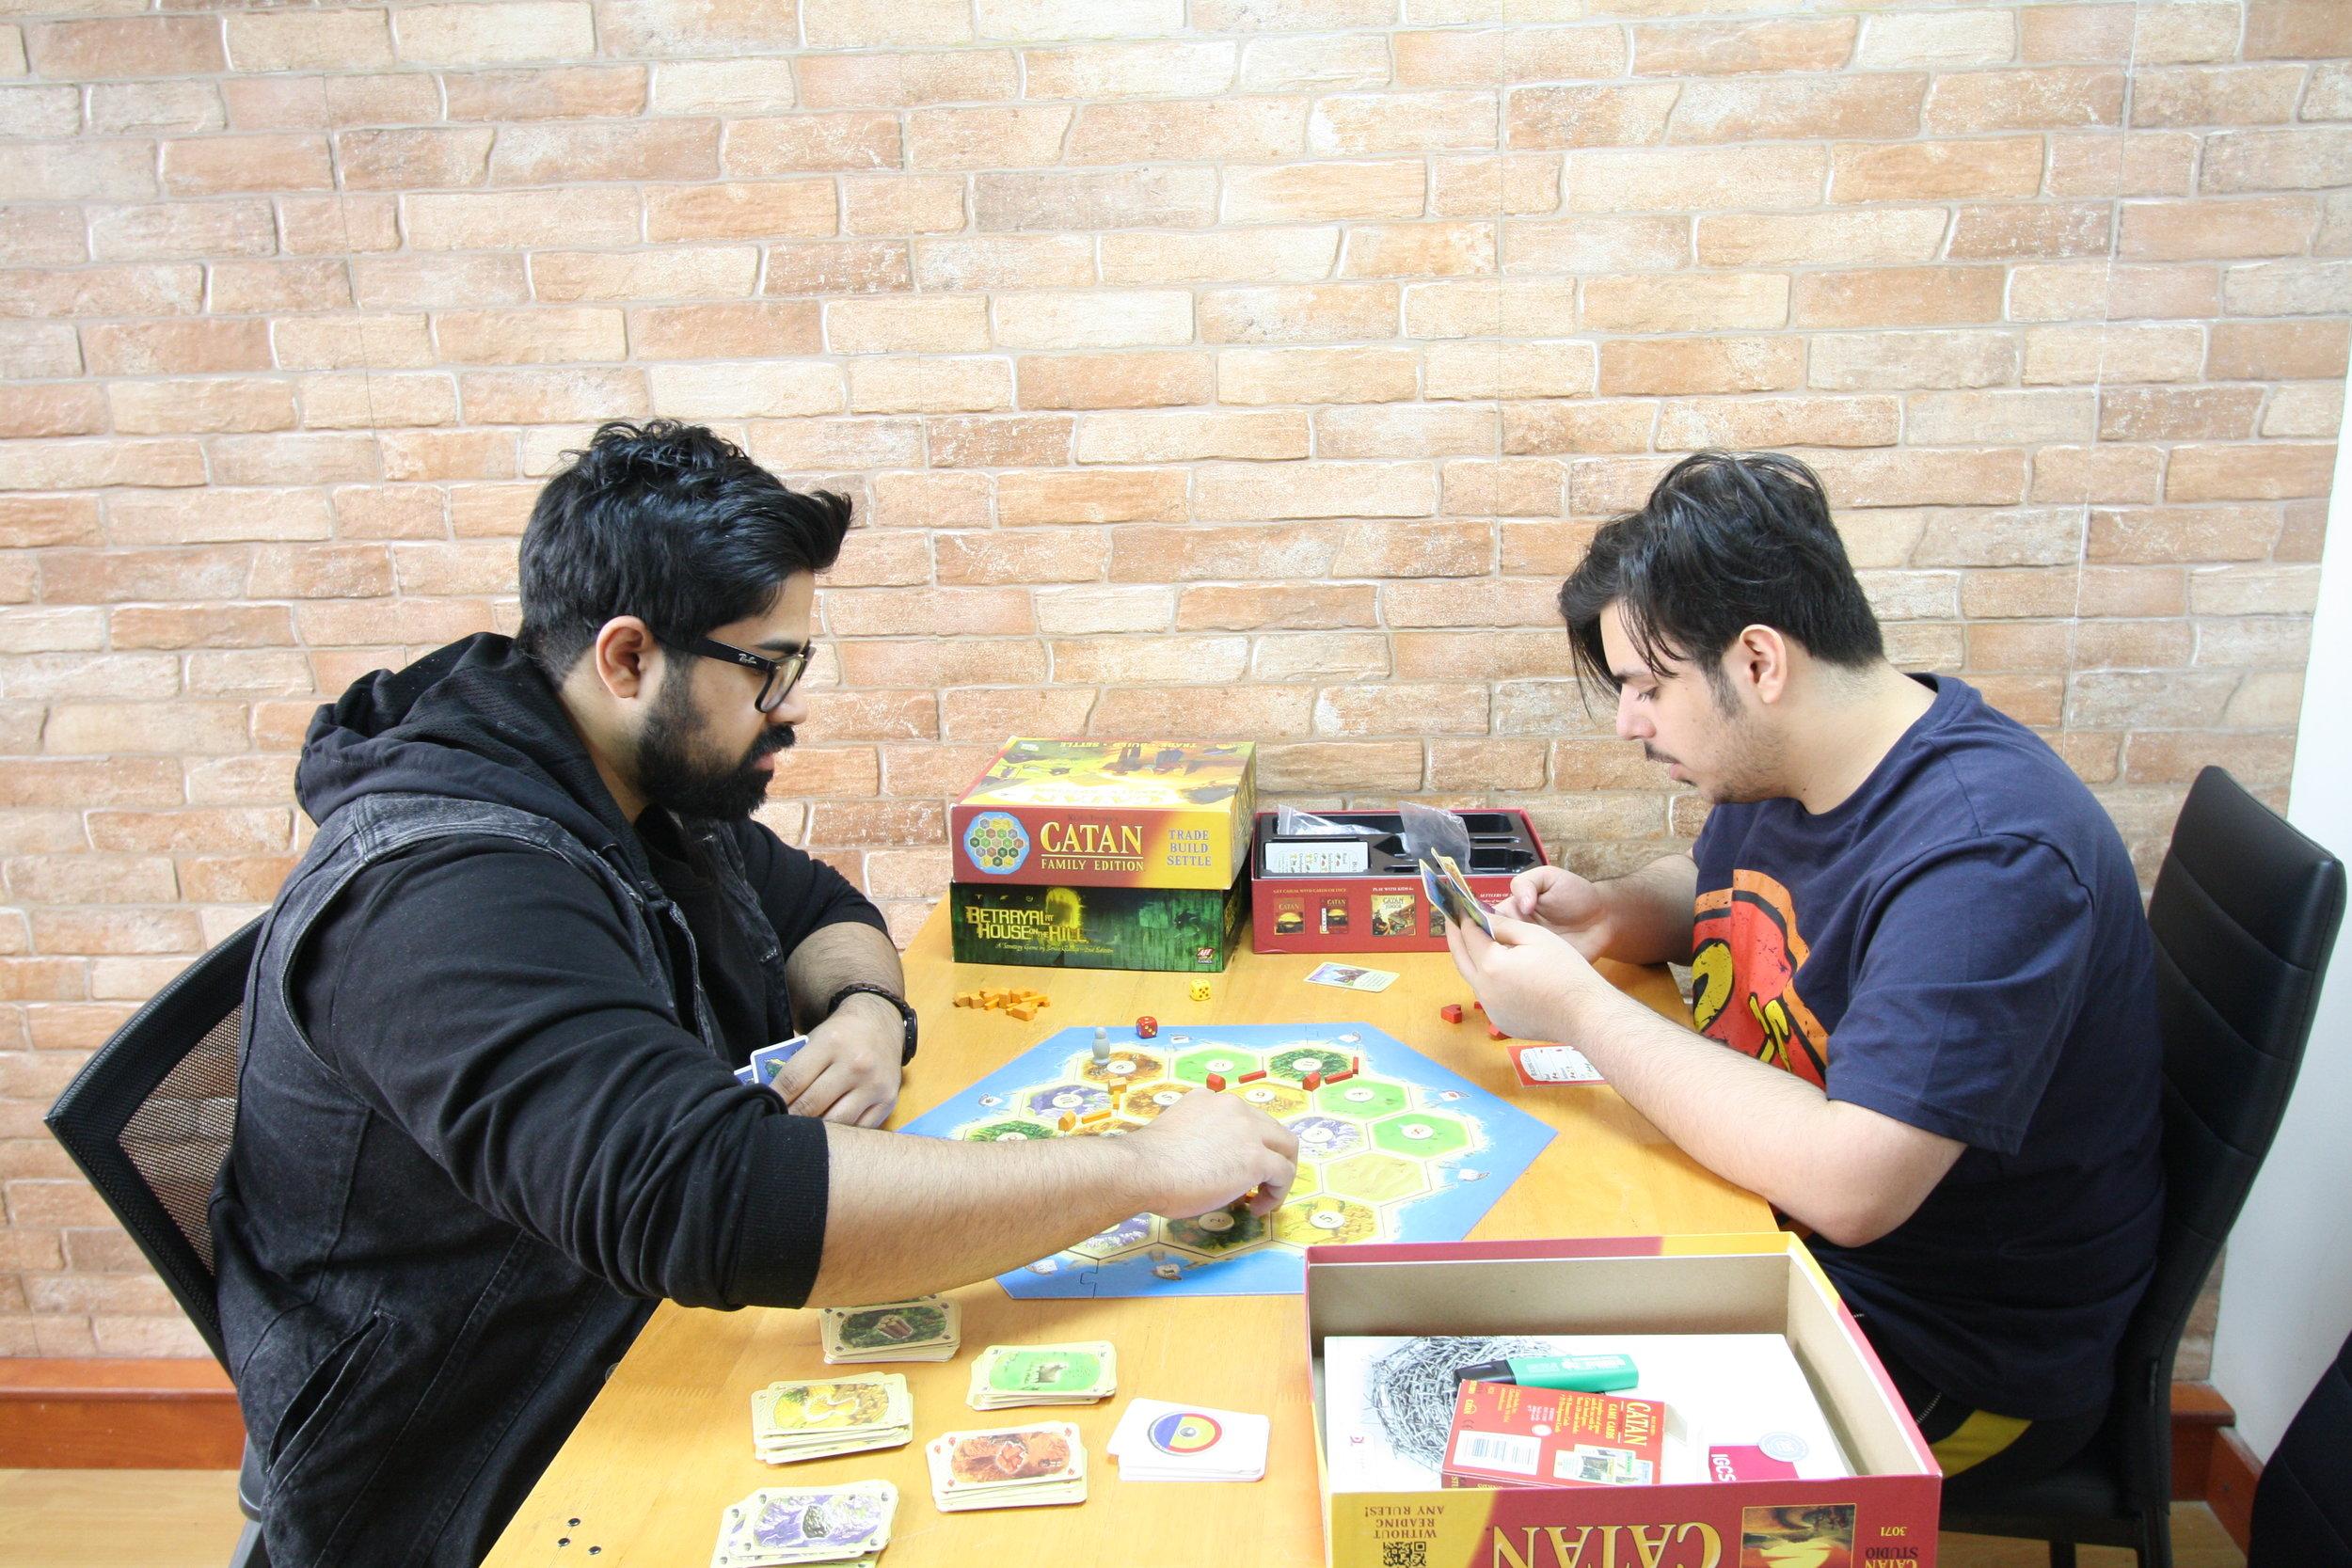 boardgame club in bahrain